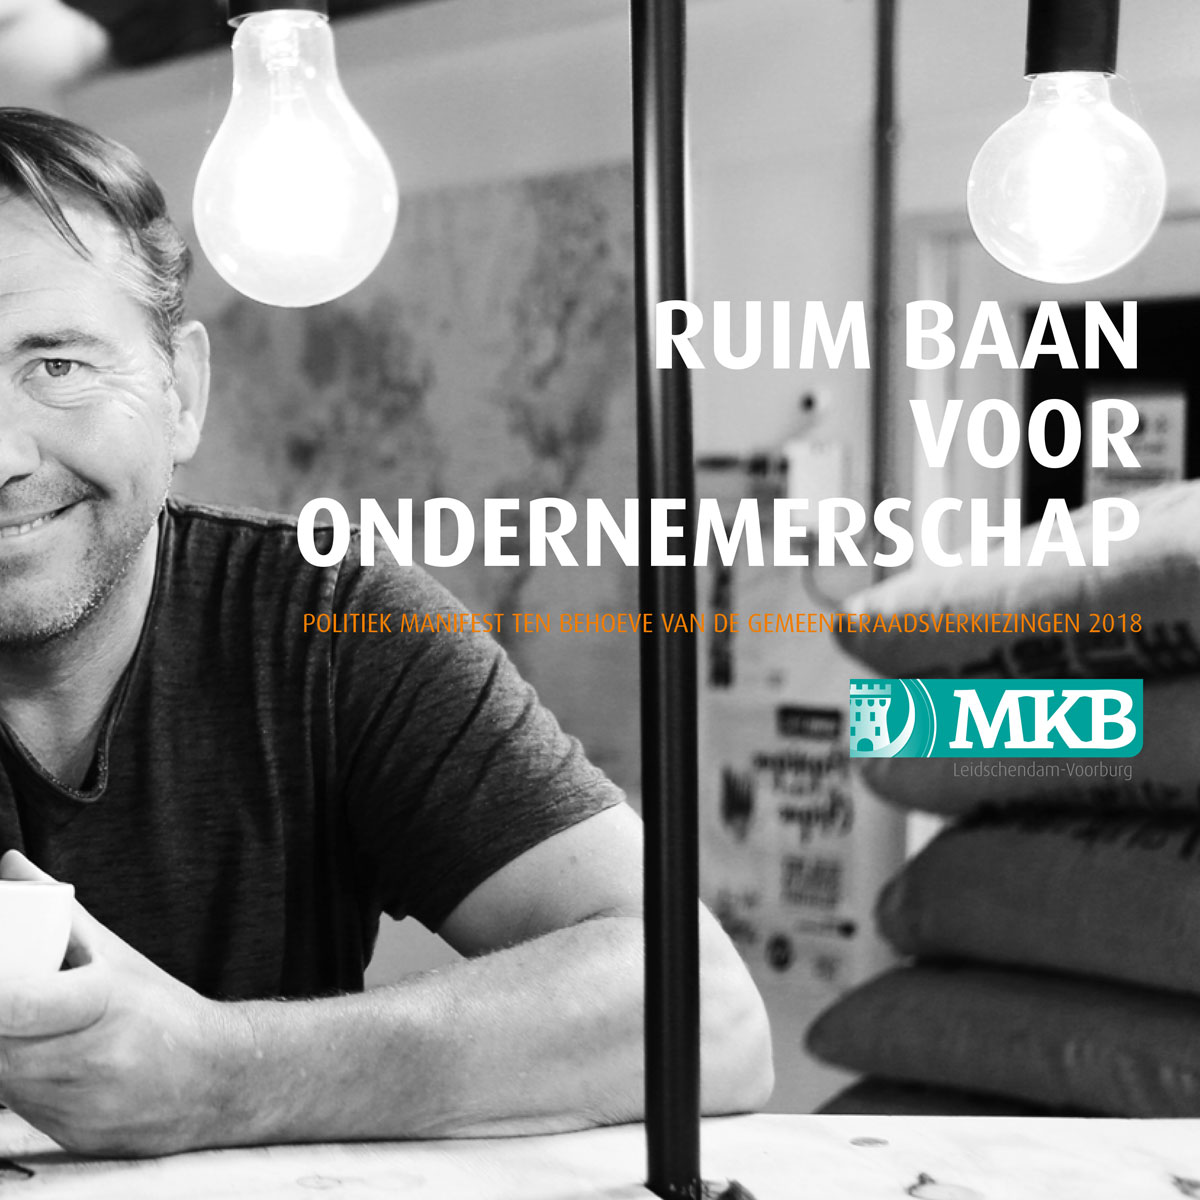 MKBLV-Politiek-Manifest-gemeenteverkiezingen-2018-voorkant-web